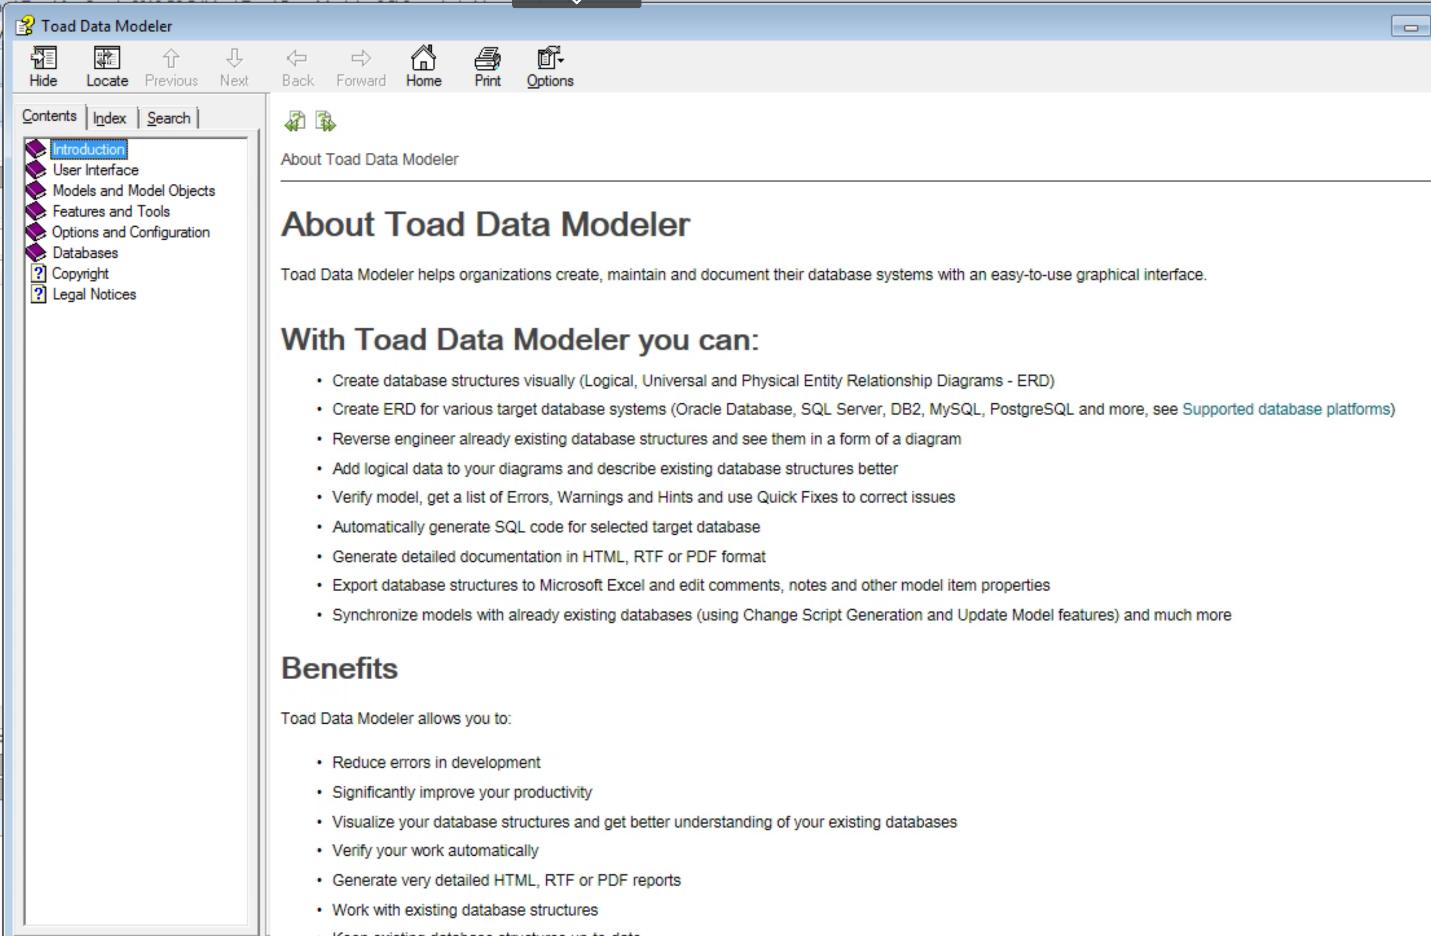 Figure 6. Toad Data Modeler Help